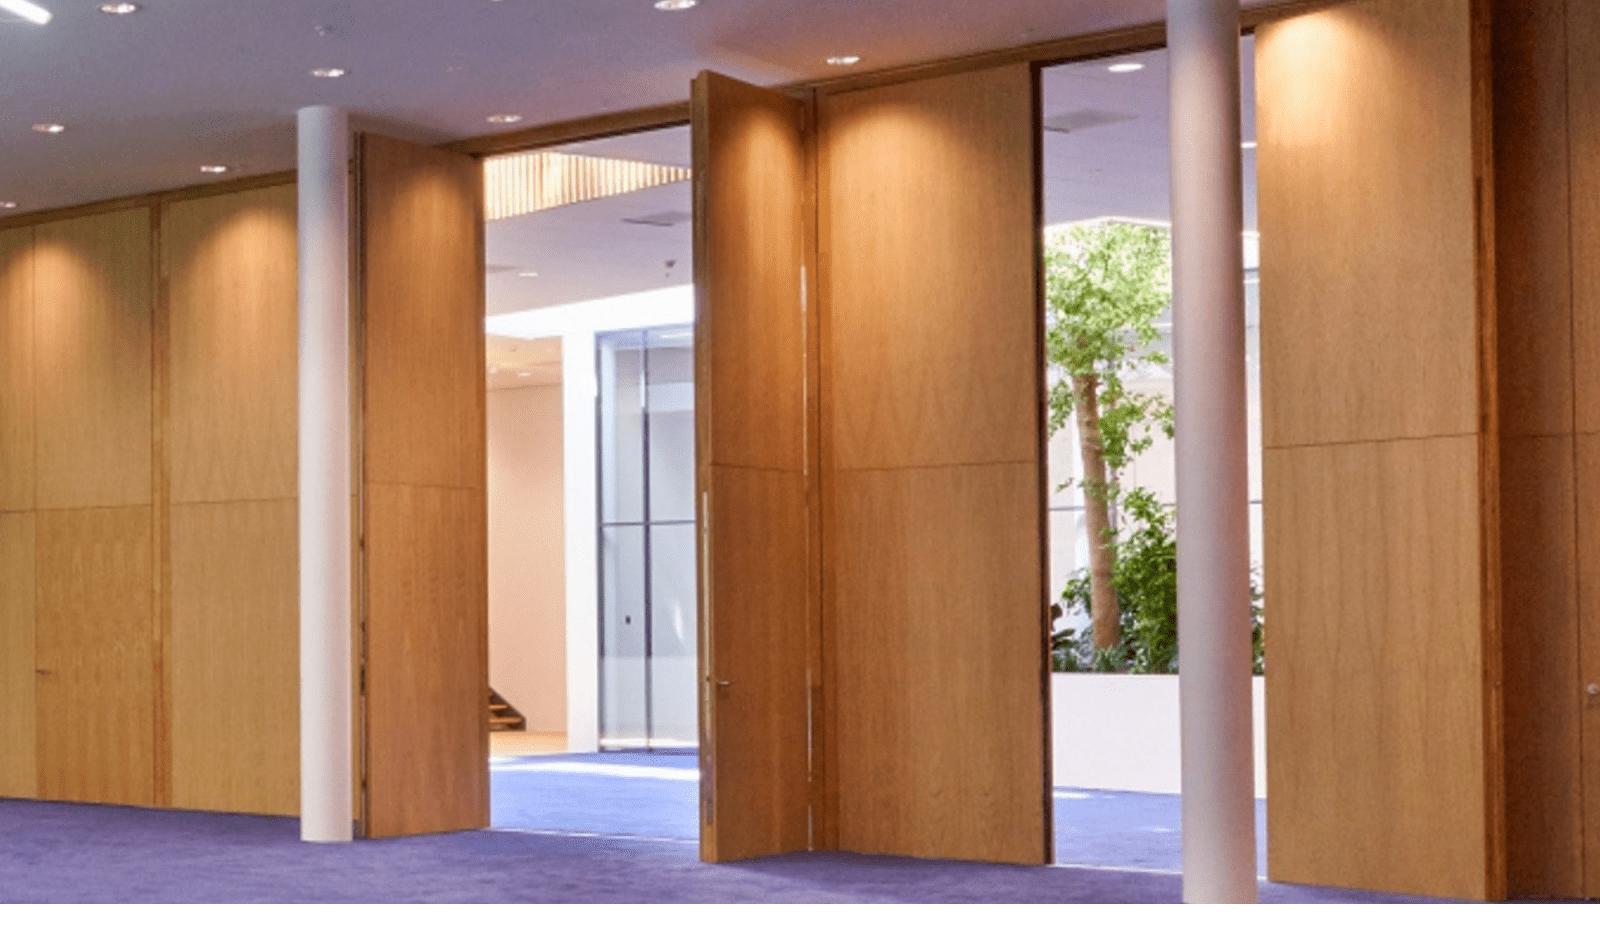 NCIA grote scharnierdeur van Harryvan Interieurbouw